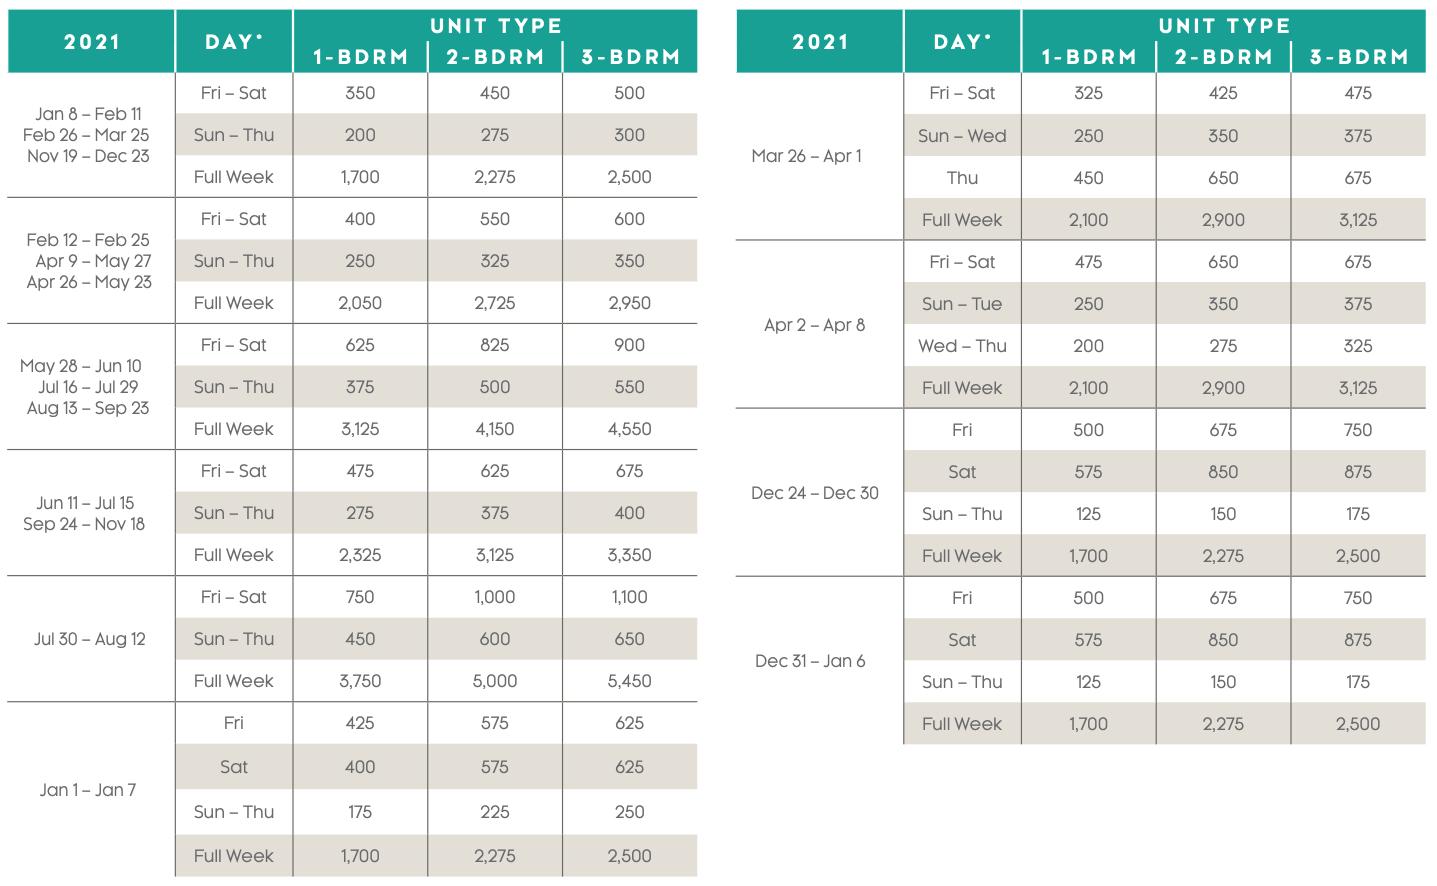 Marbella Beach Resort Points Charts 2021